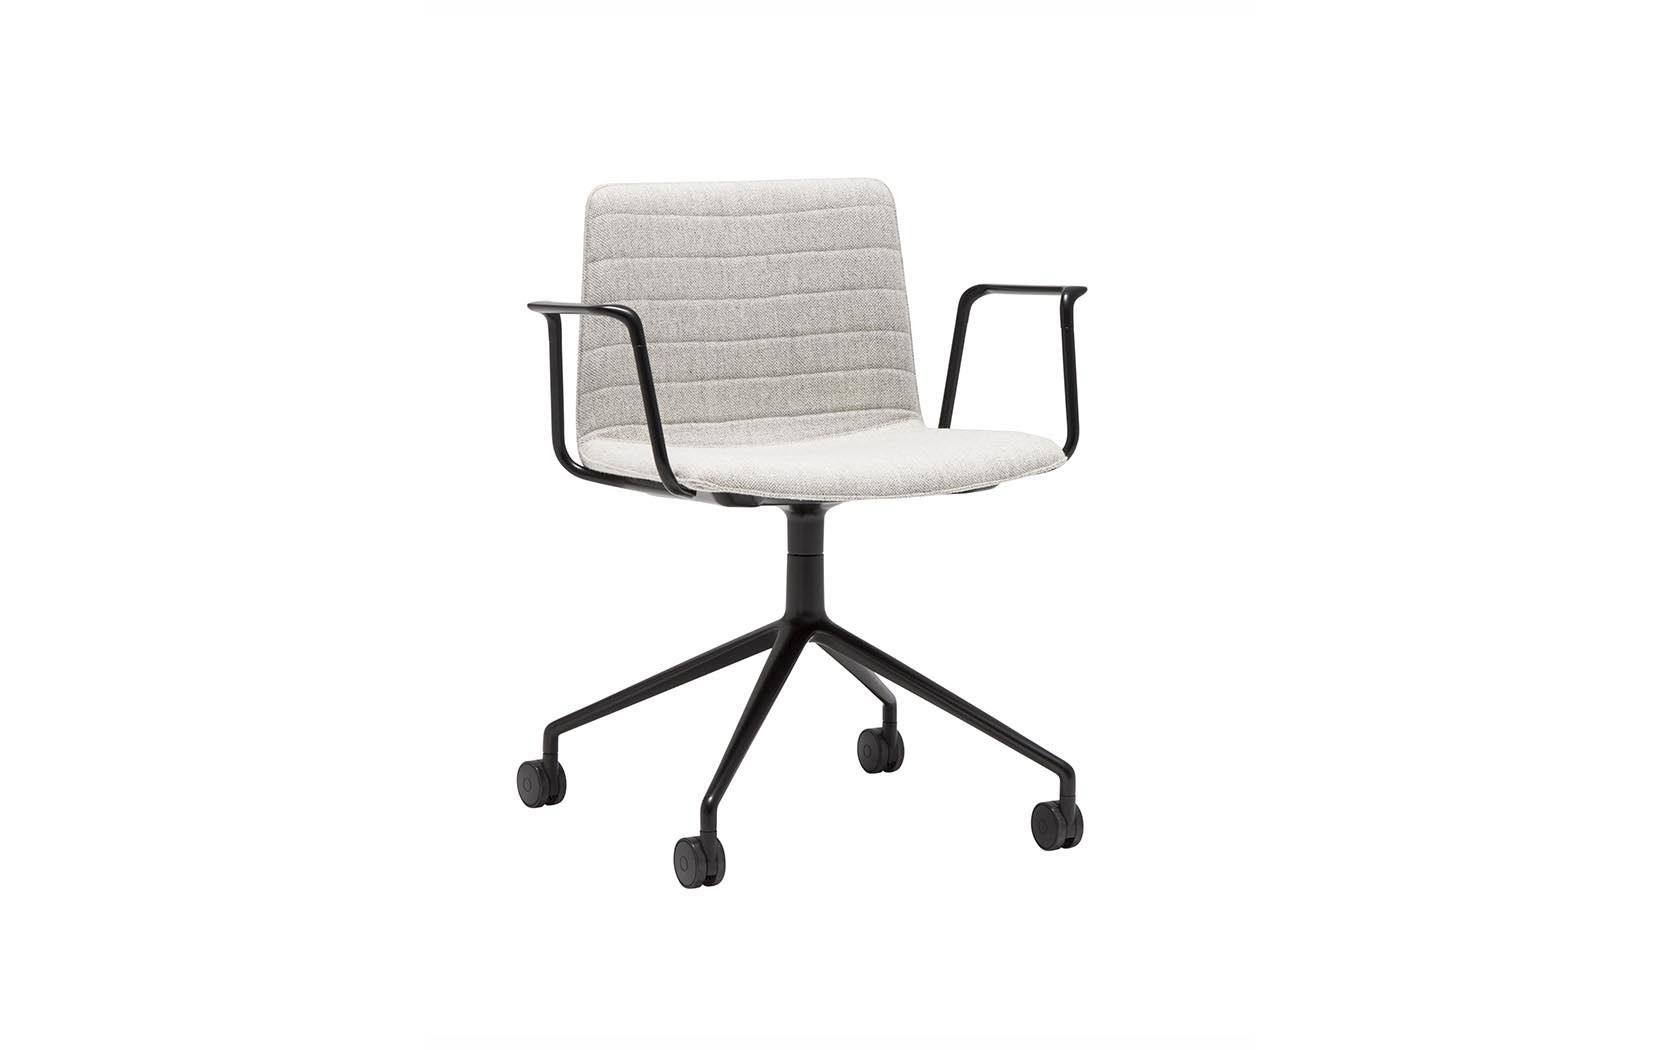 Surprising Flex Chair By Andreu World Stylepark Lamtechconsult Wood Chair Design Ideas Lamtechconsultcom